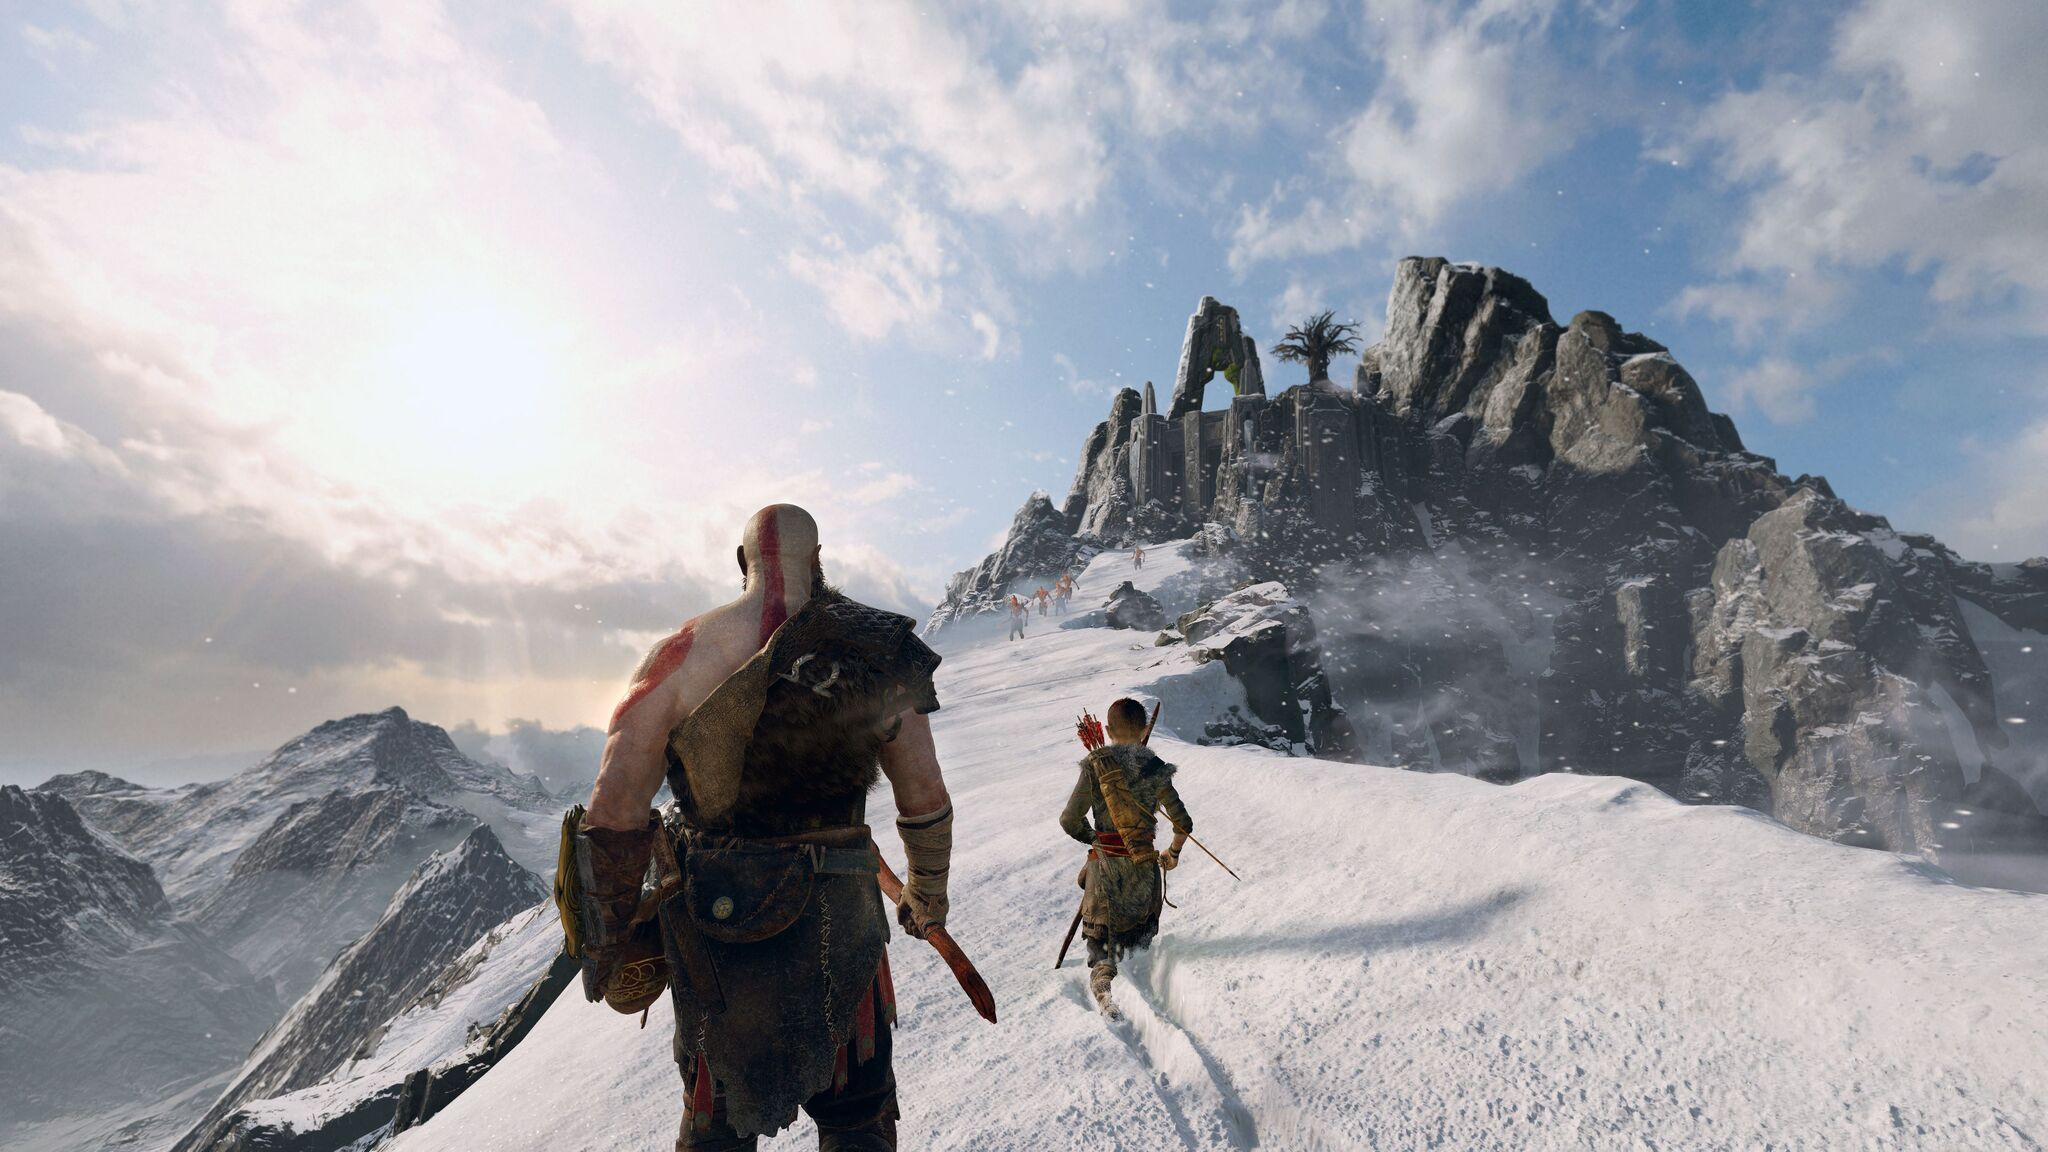 4k-god-of-war-4-kratos-and-atreus-2018-yf.jpg